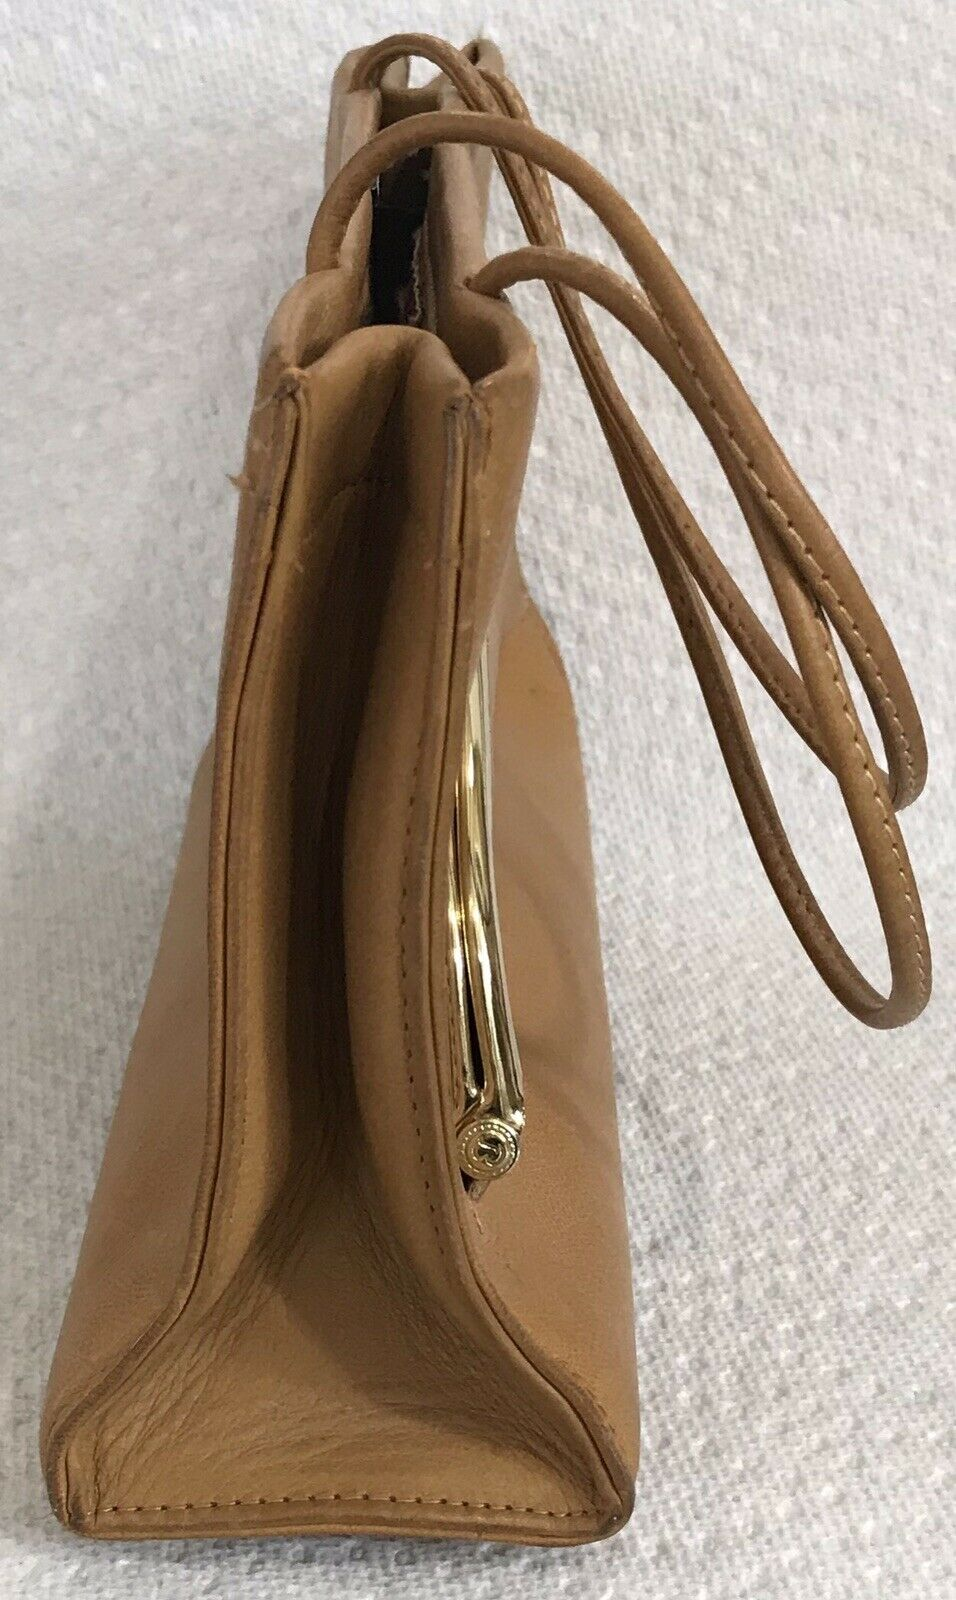 Vintage Coach Rare Leather Bonnie Cashin Stripe I… - image 7